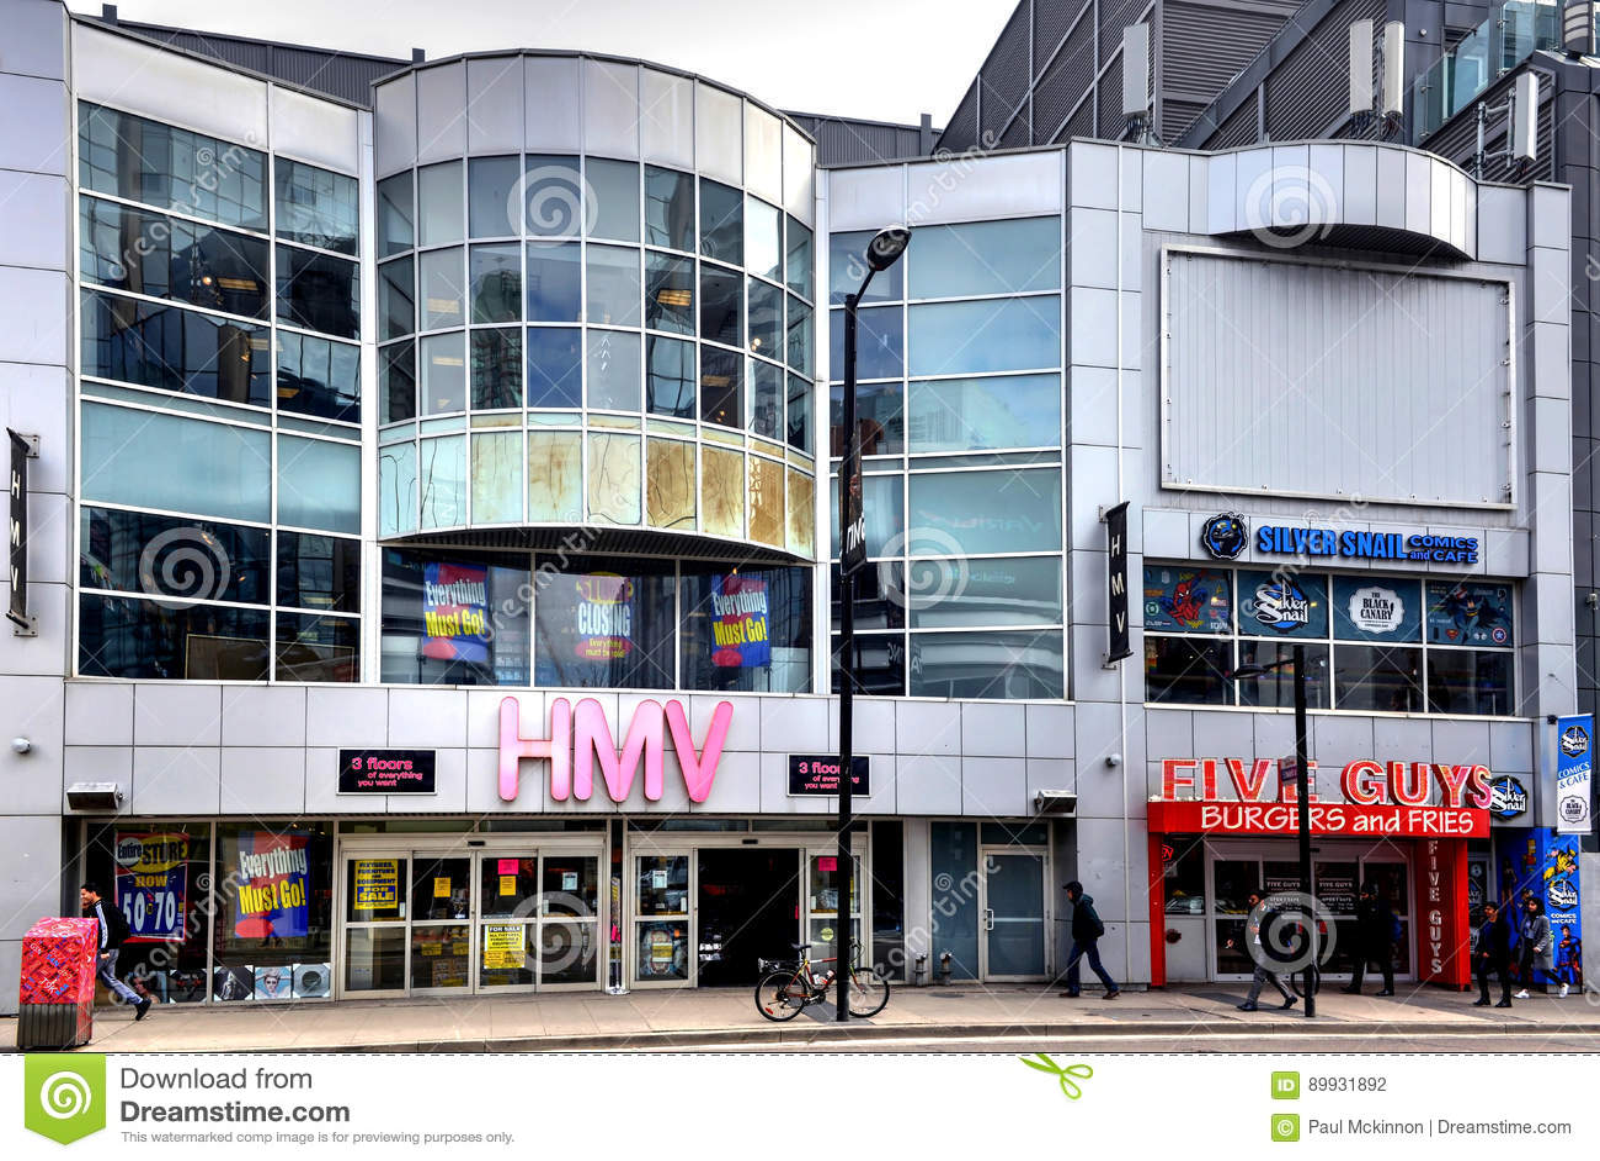 HMV on Yonge Street closing